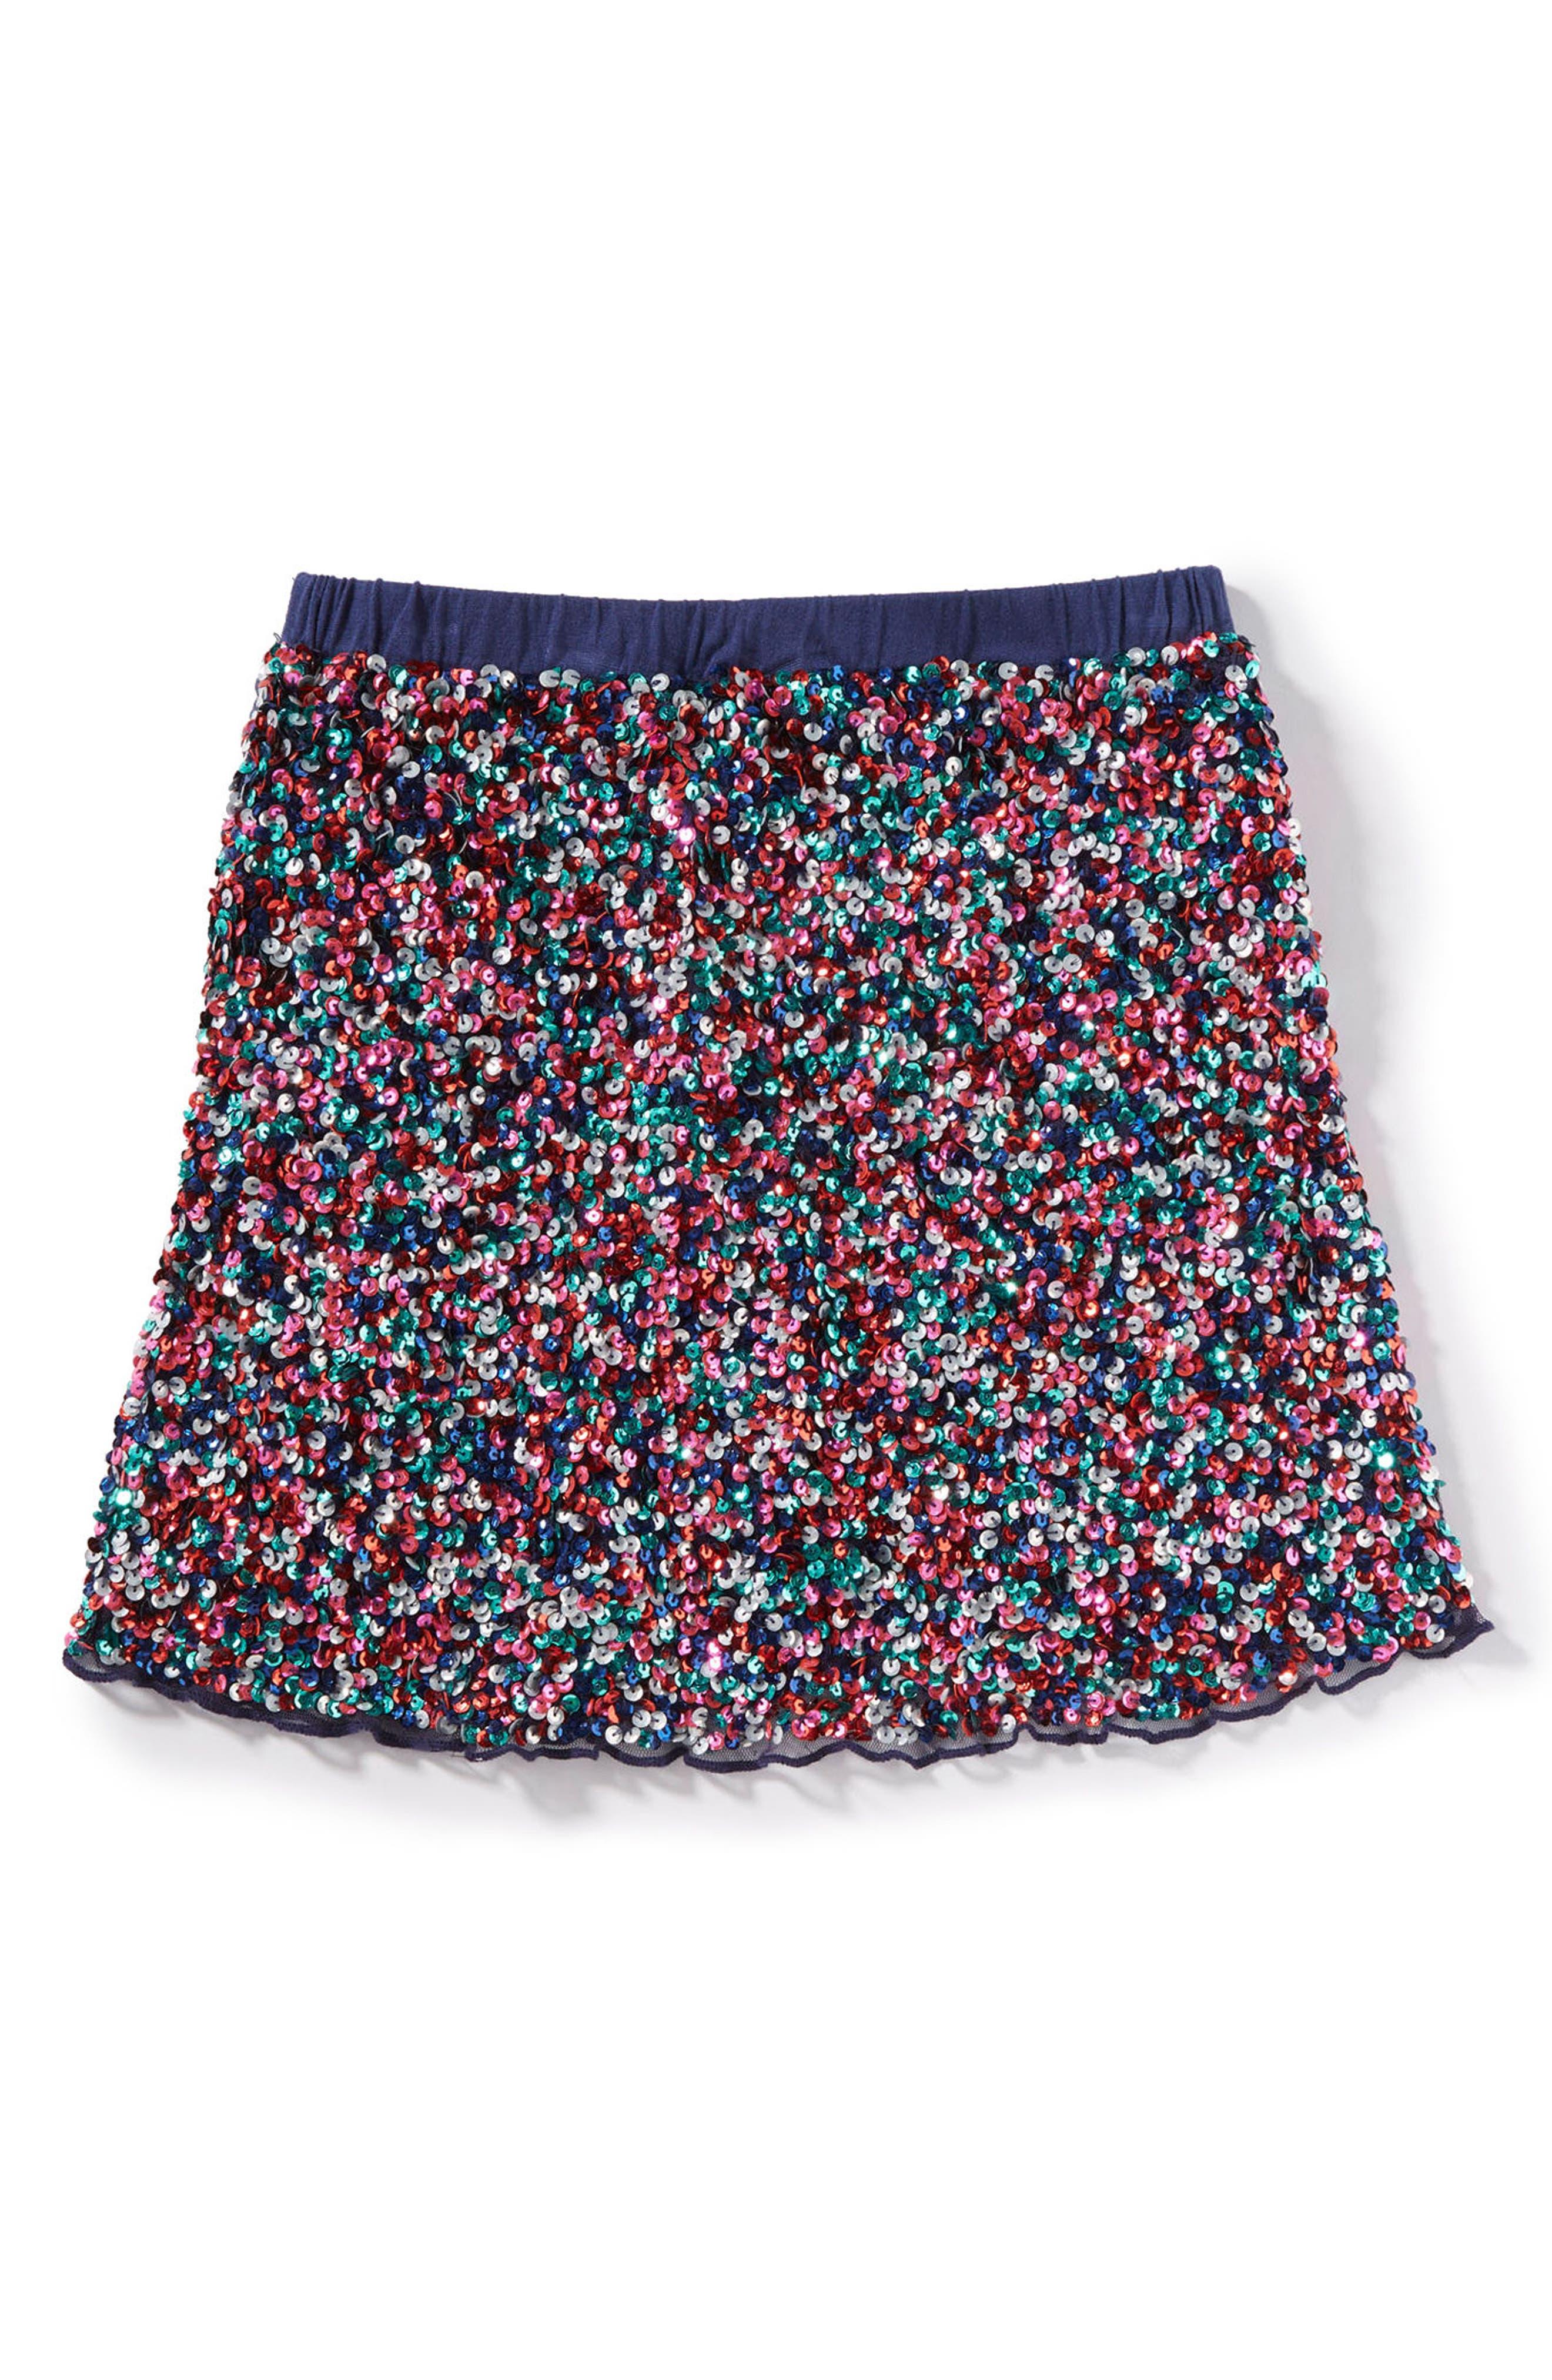 Ella Sequin Skirt,                             Main thumbnail 1, color,                             410